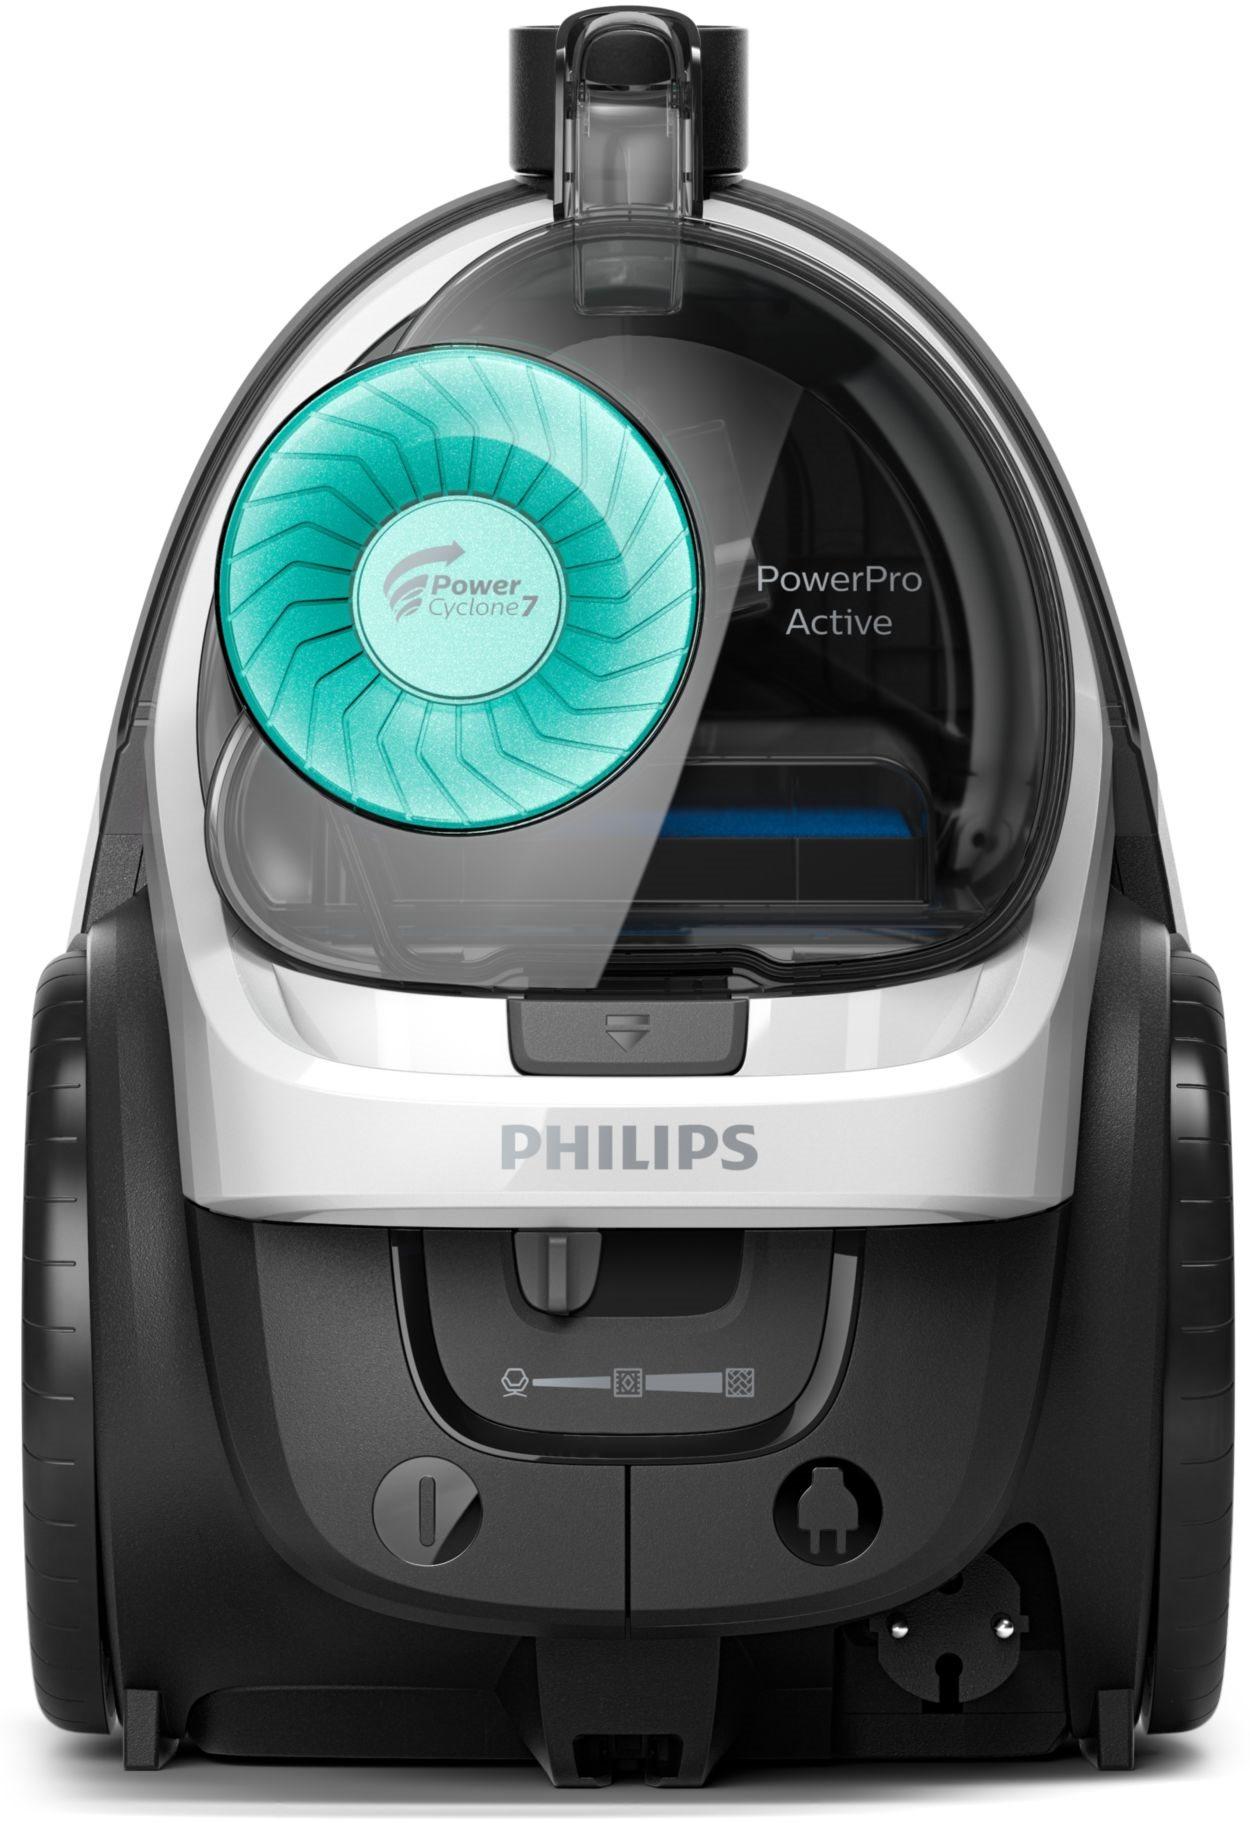 Philips Ηλεκτρική Σκούπα 650W με Κάδο 1.5lt PowerPro Active FC9553/09